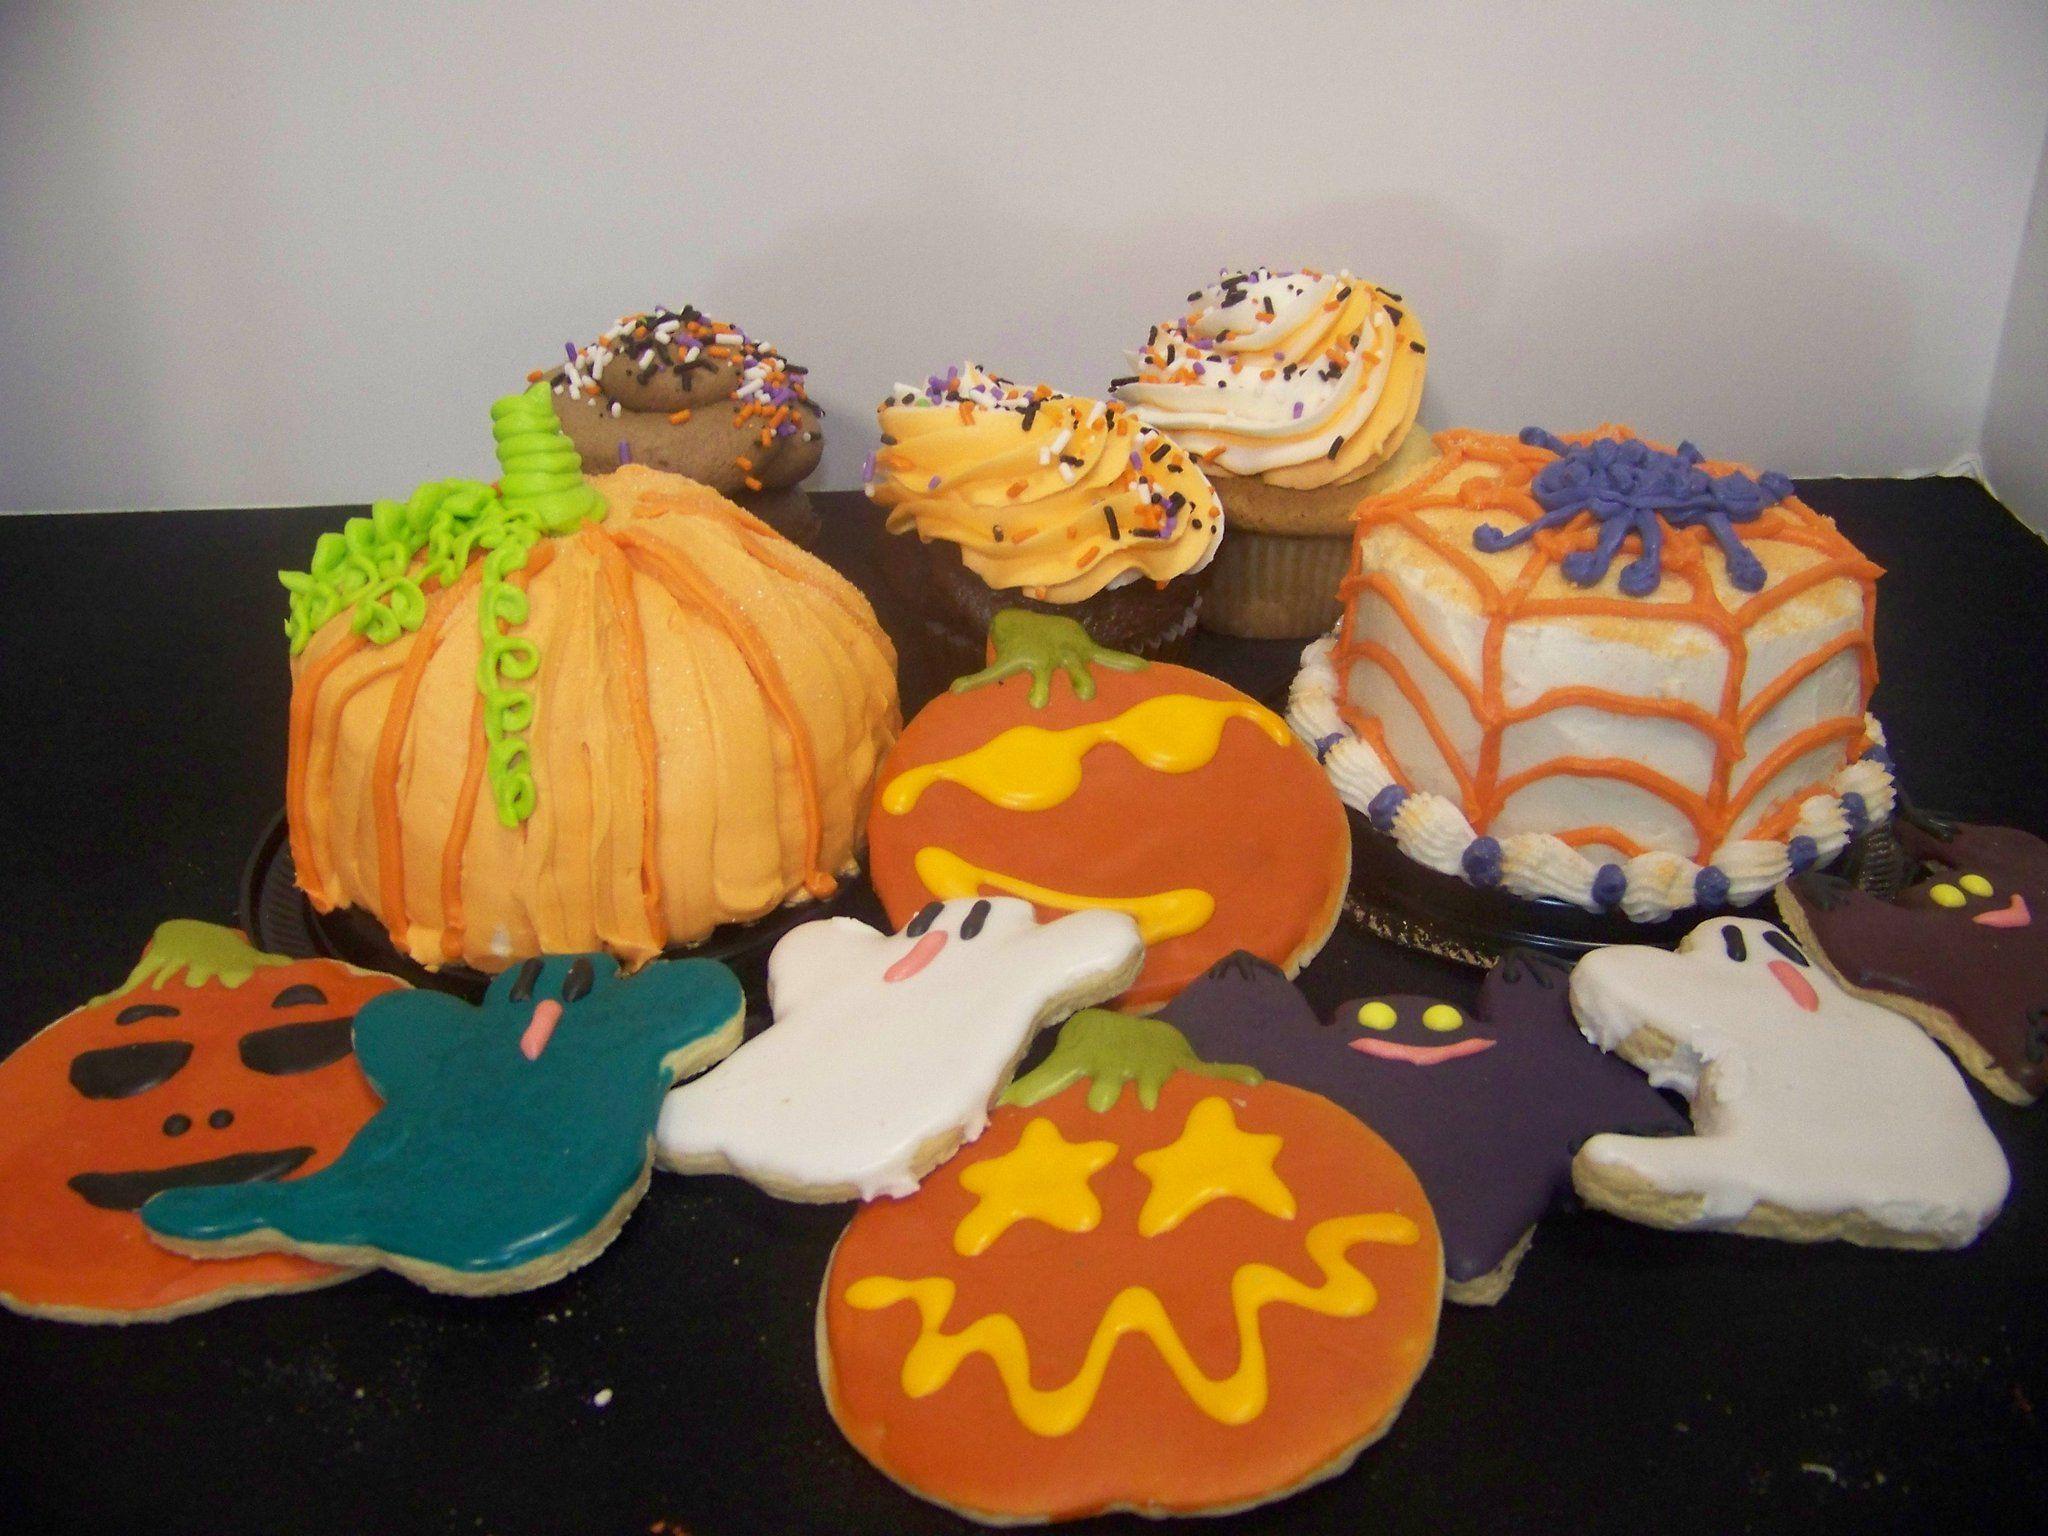 Halloween desserts available at Adagio